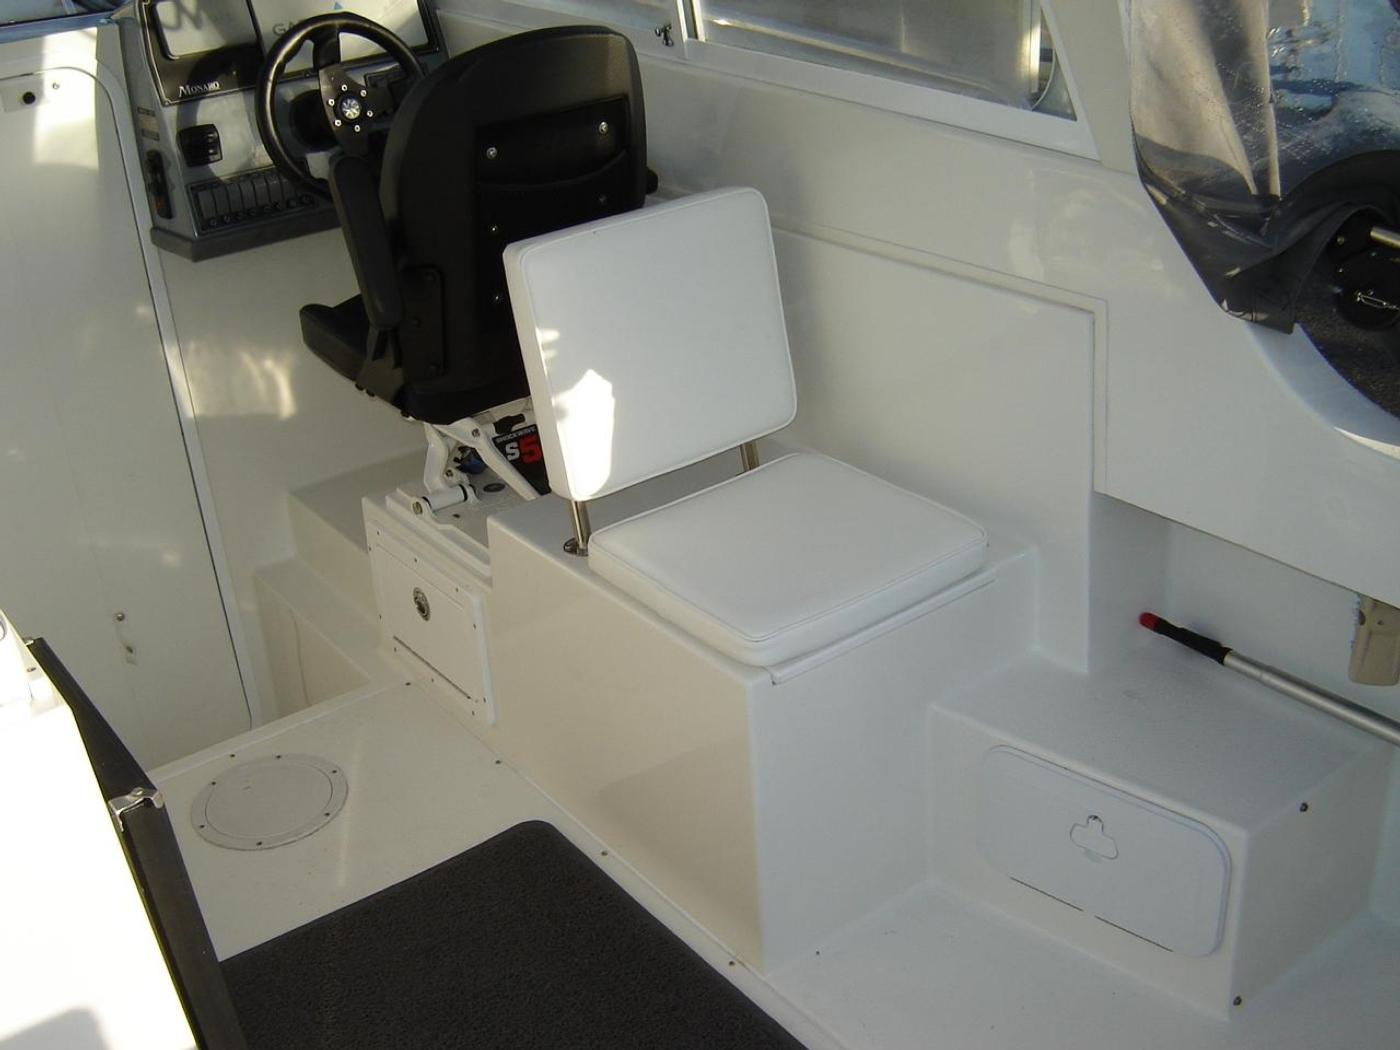 2019 Monaro 235 Sport, Aft Facing Seat with Storage Below